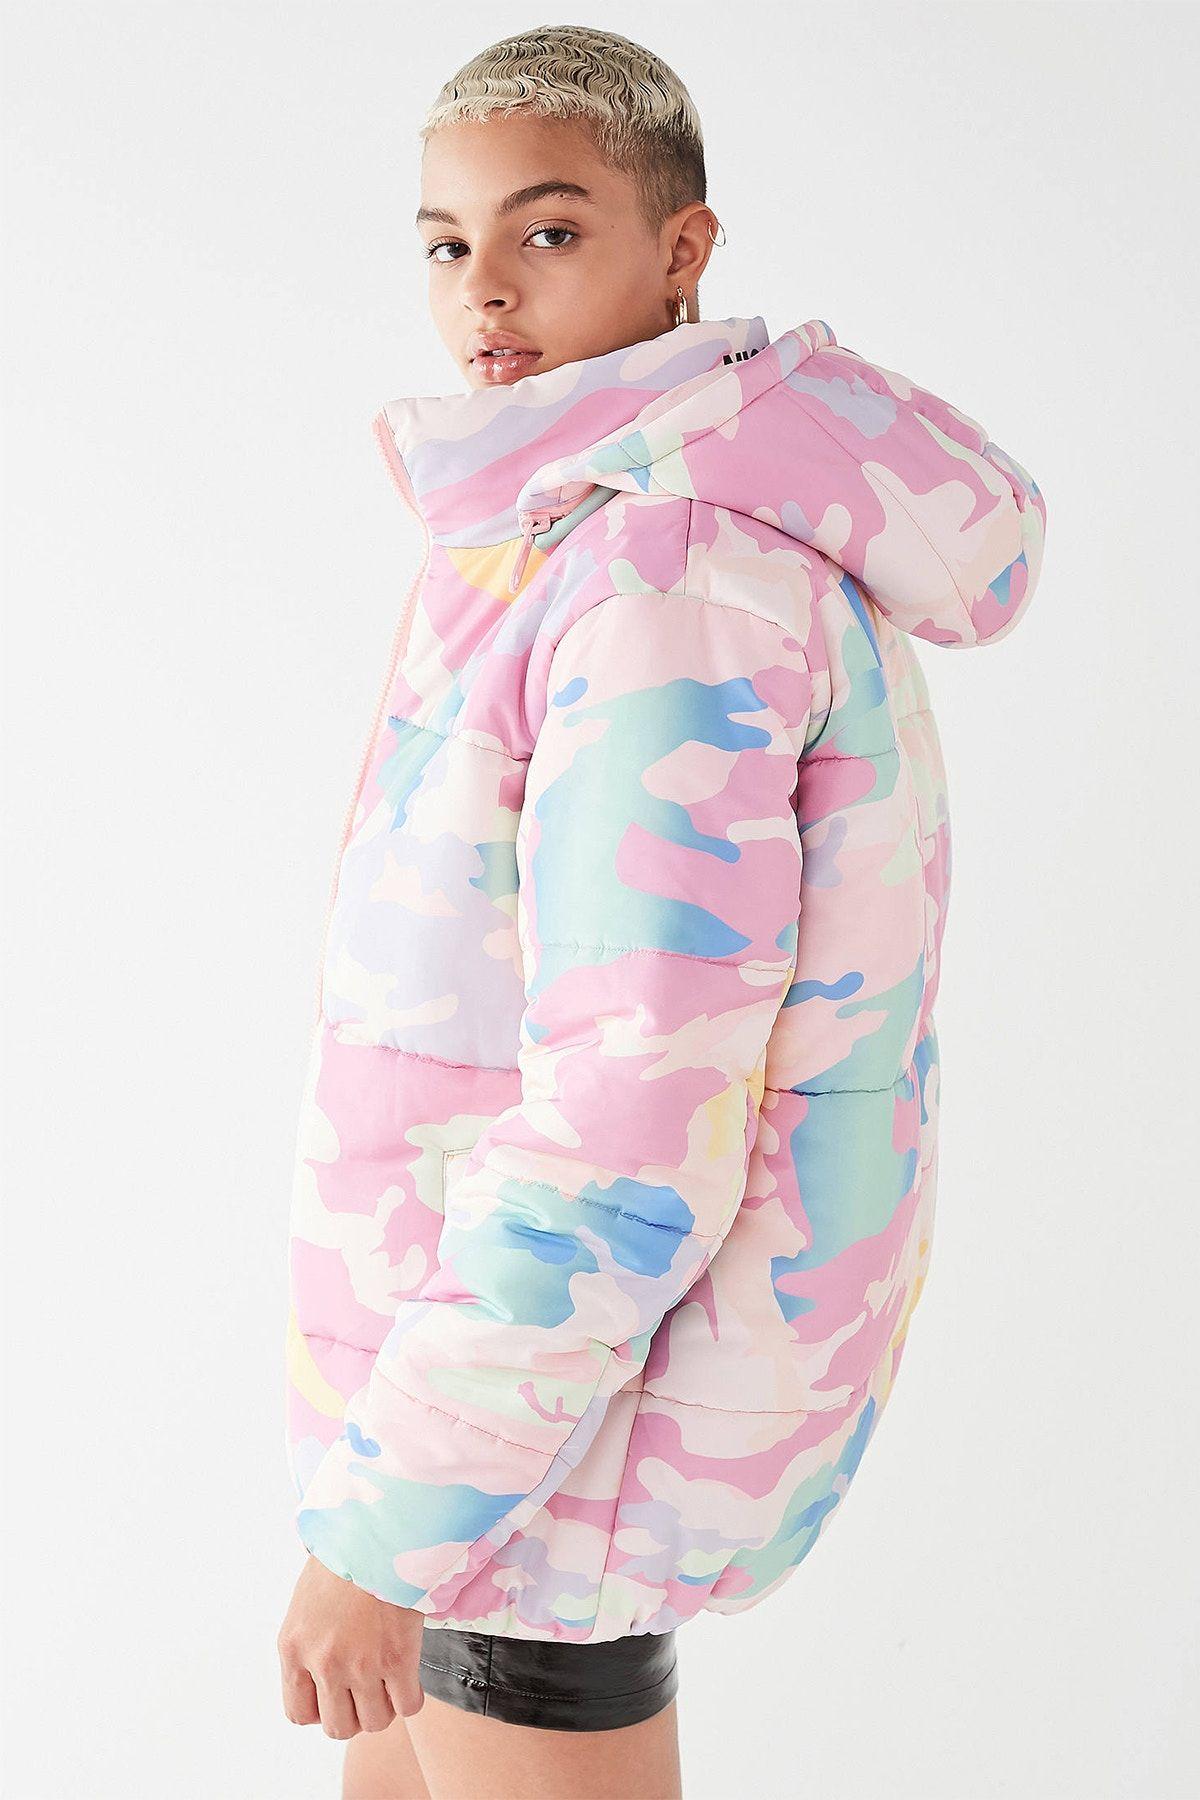 Pastel Camo Takes Over This Nicopanda X Urban Outfitters Puffer Jacket Urban Wear Urban Fashion Girls Black Urban Fashion [ 1800 x 1200 Pixel ]